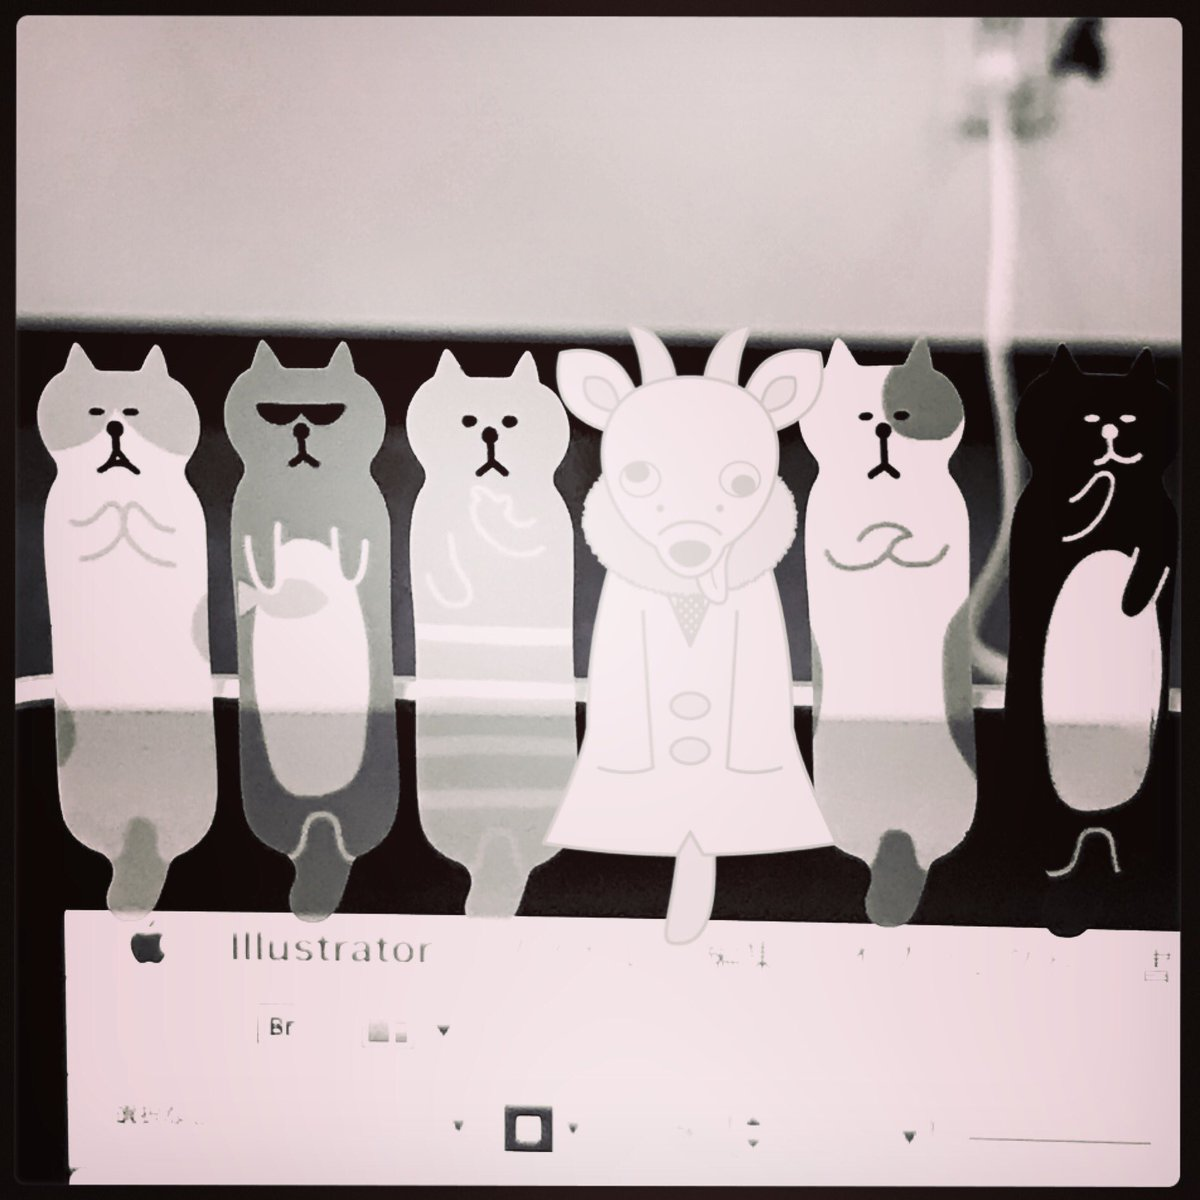 test ツイッターメディア - #キャンドゥ でかわいい付箋みつけたよぉ? 僕も付箋に混ざってみたんだけど、 うんうん、僕ってきっと付箋になっても可愛いよねぇ?? #ゆるキャラ #オリジナルキャラクター  #絵描きさんと繋がりたい #イラスト好きな人と繋がりたい https://t.co/7ycjjji7w9